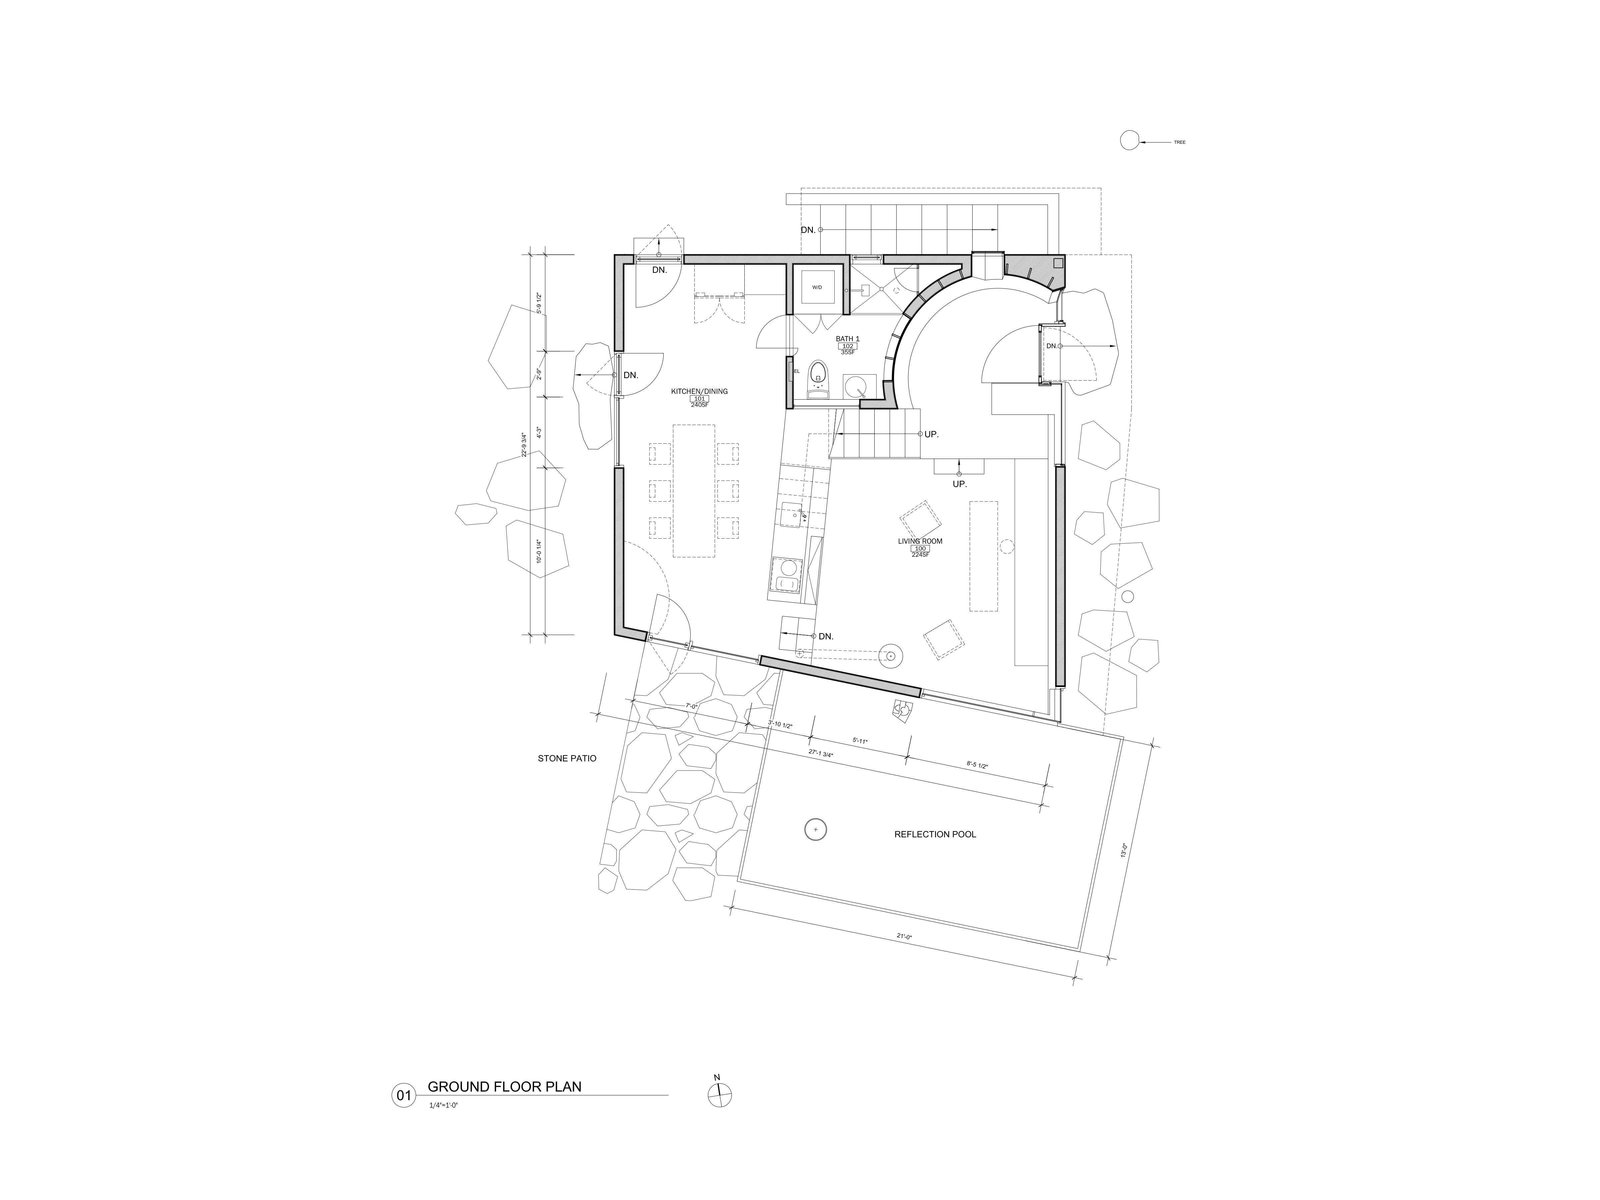 Ex of In House ground floor plan